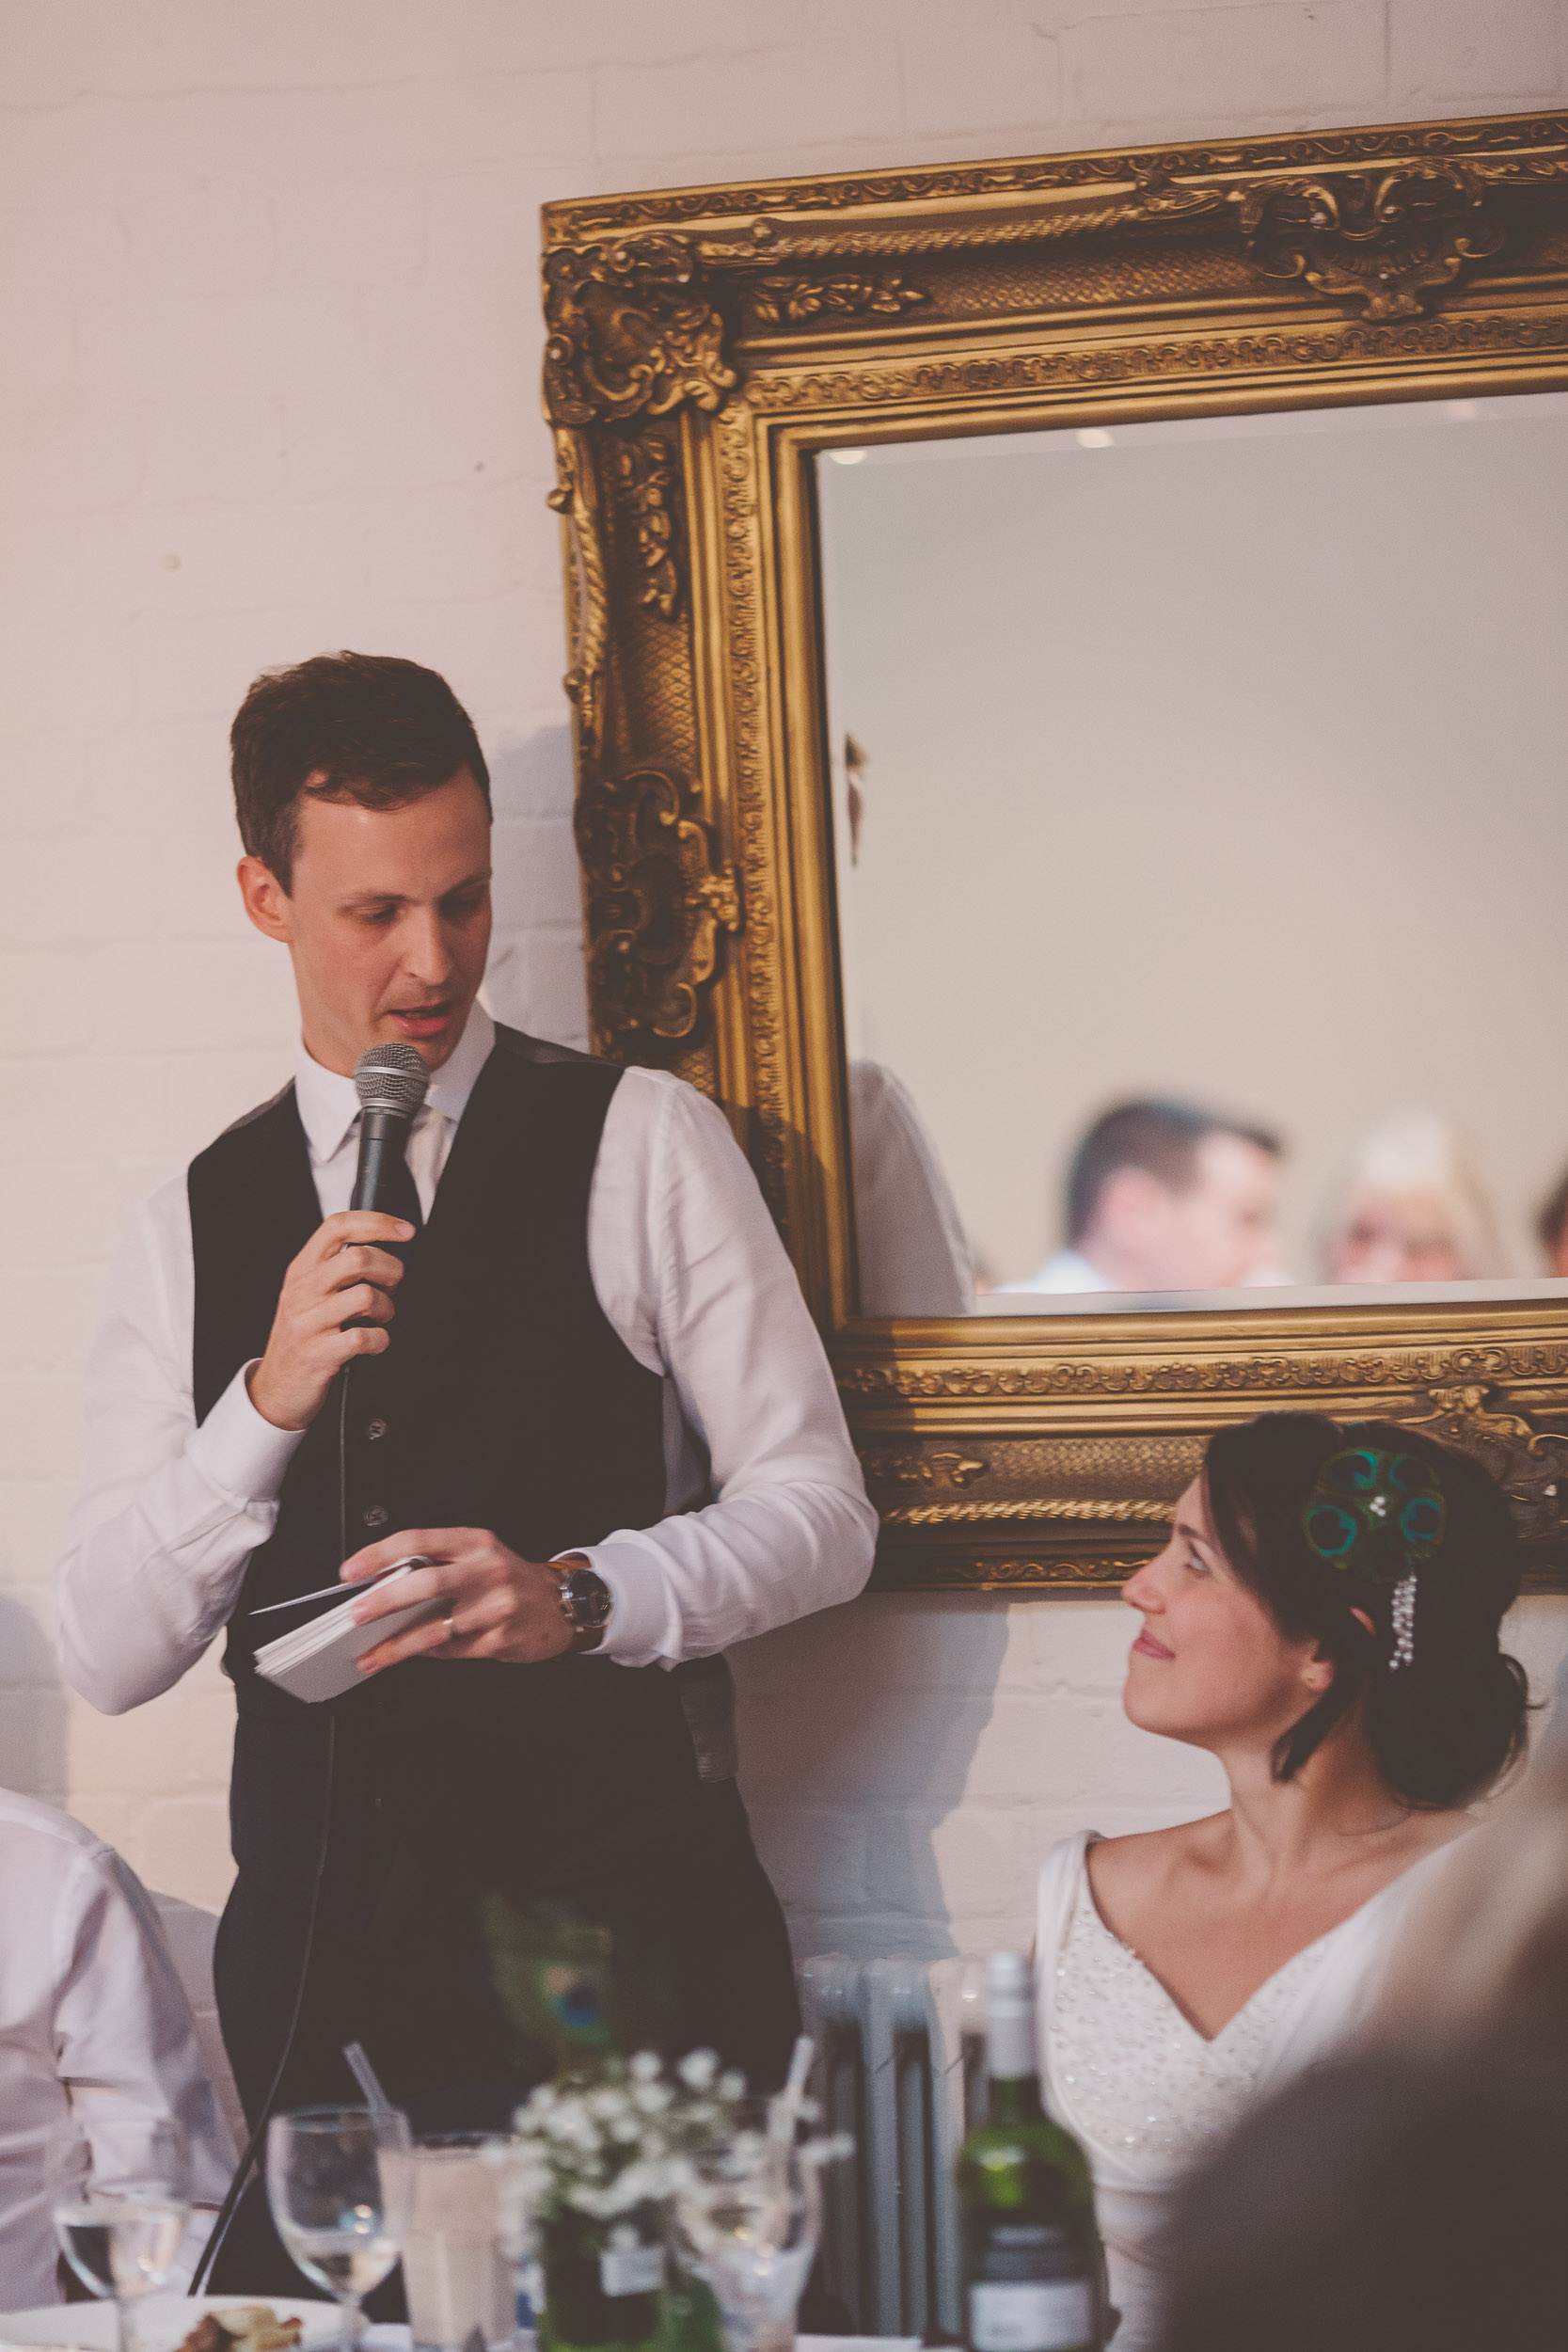 islington-town-hall-4th-floor-studios-wedding375.jpg